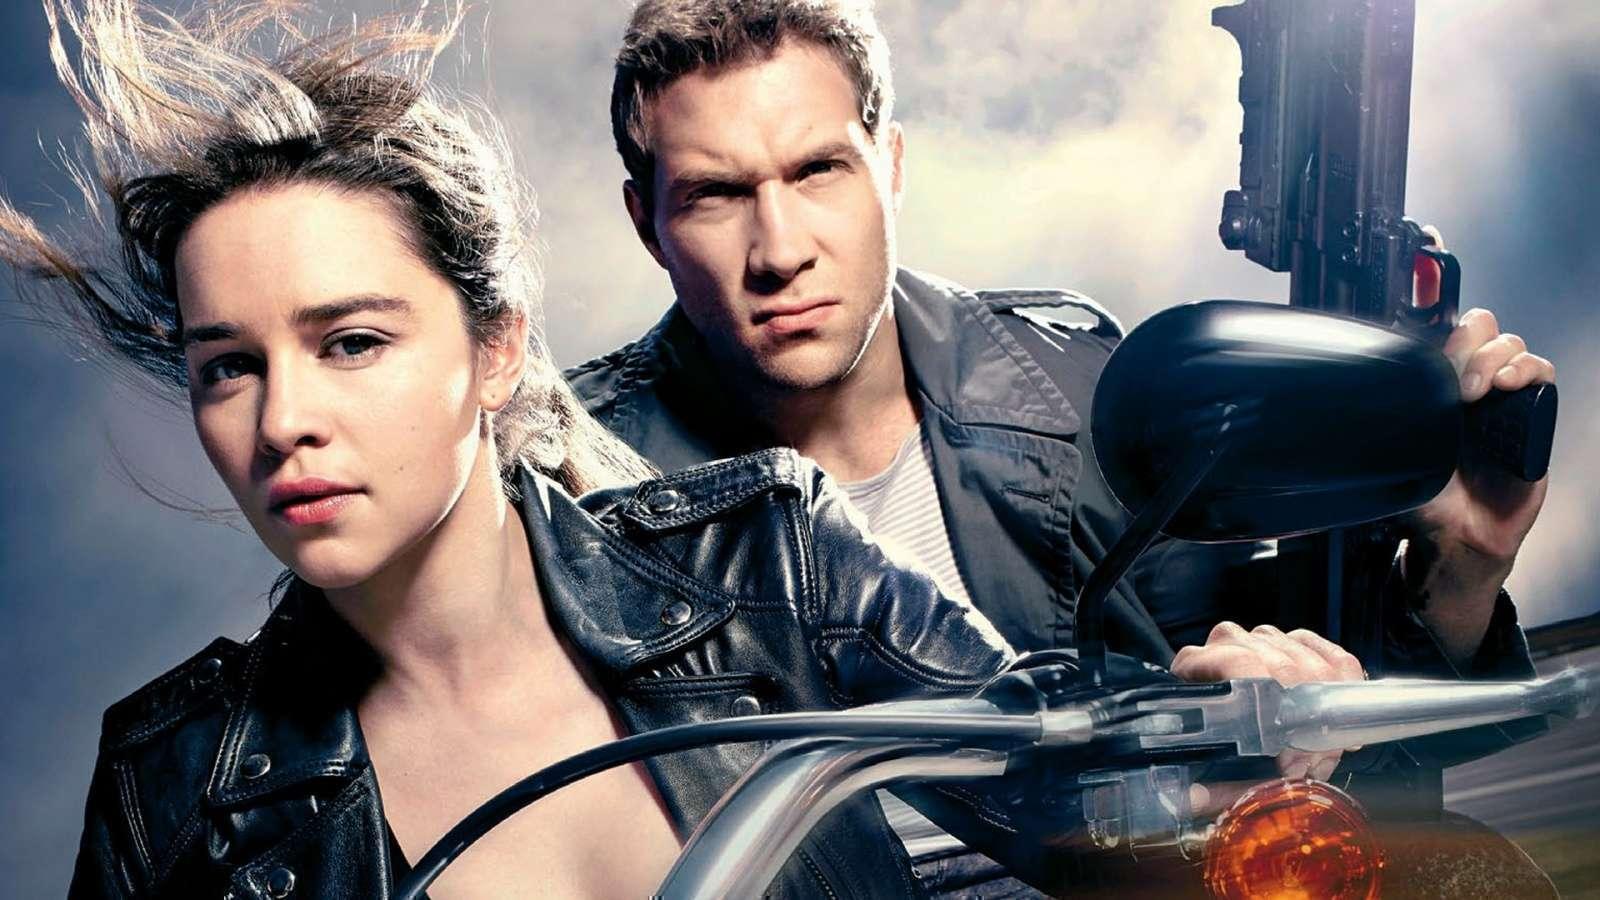 Terminator Genisys scene